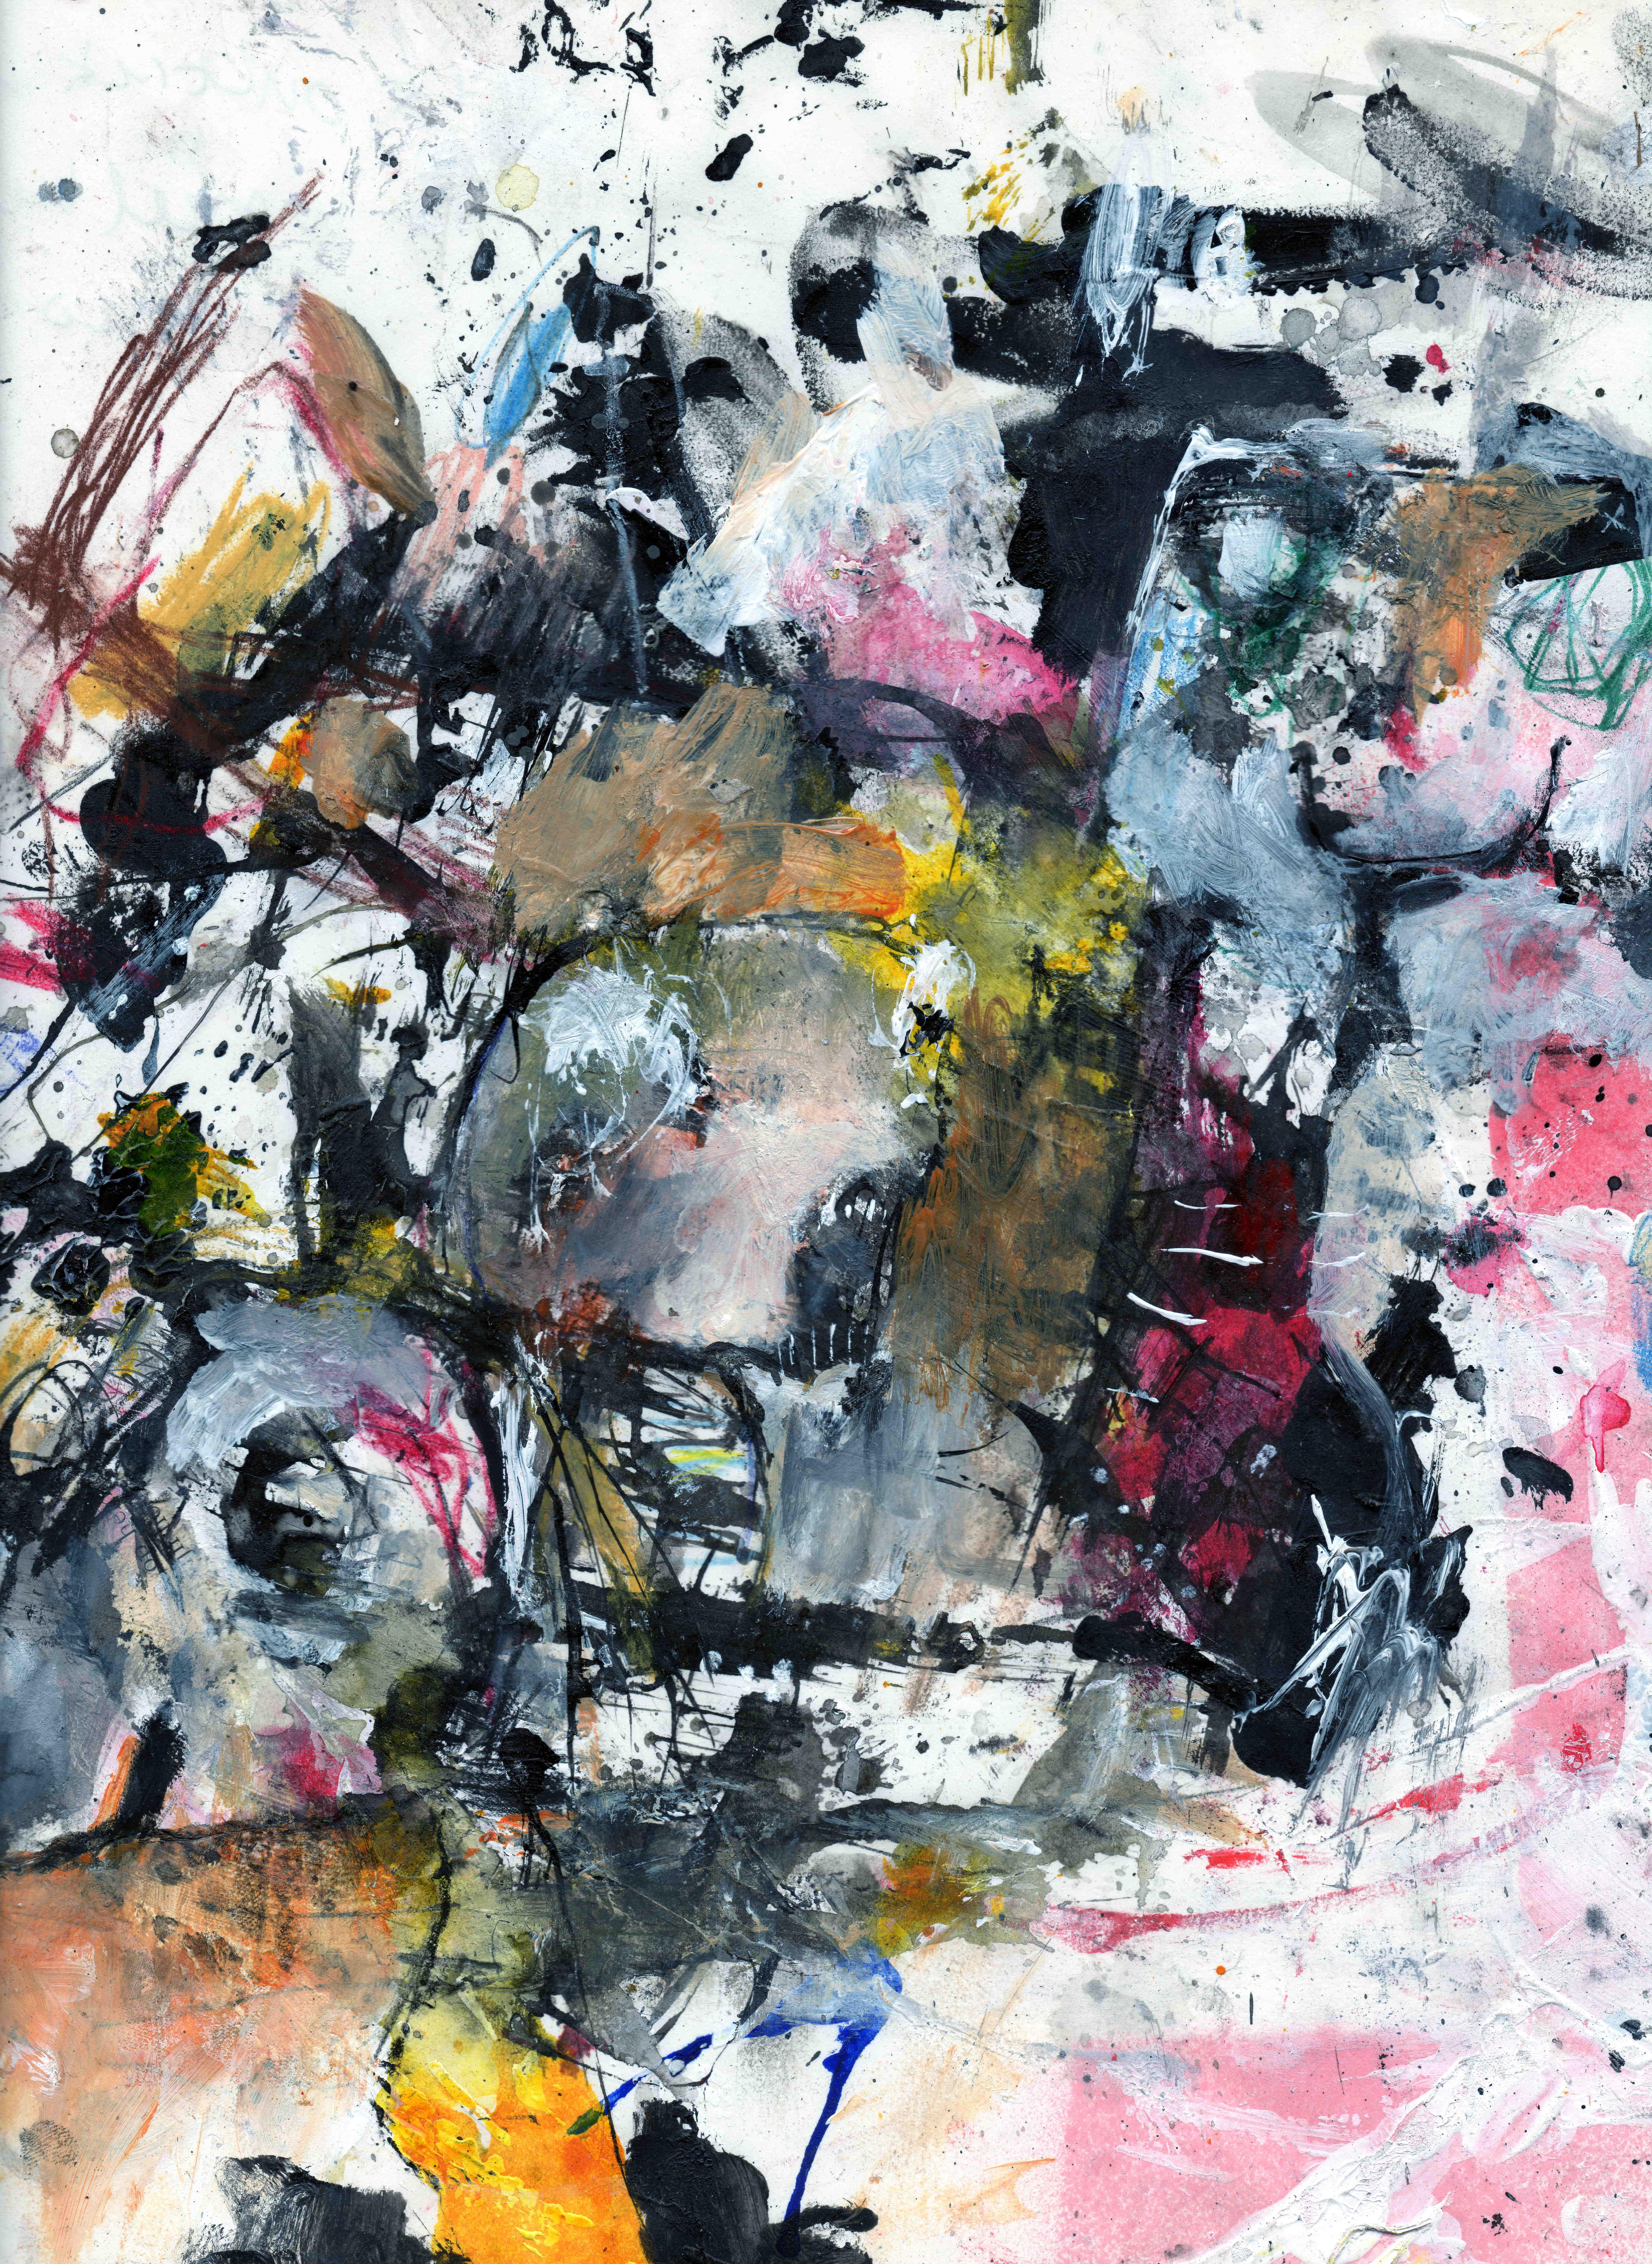 ik onttrek mij, mixed media on paper, 23,7 x 30,3 cm, 2020 MH16